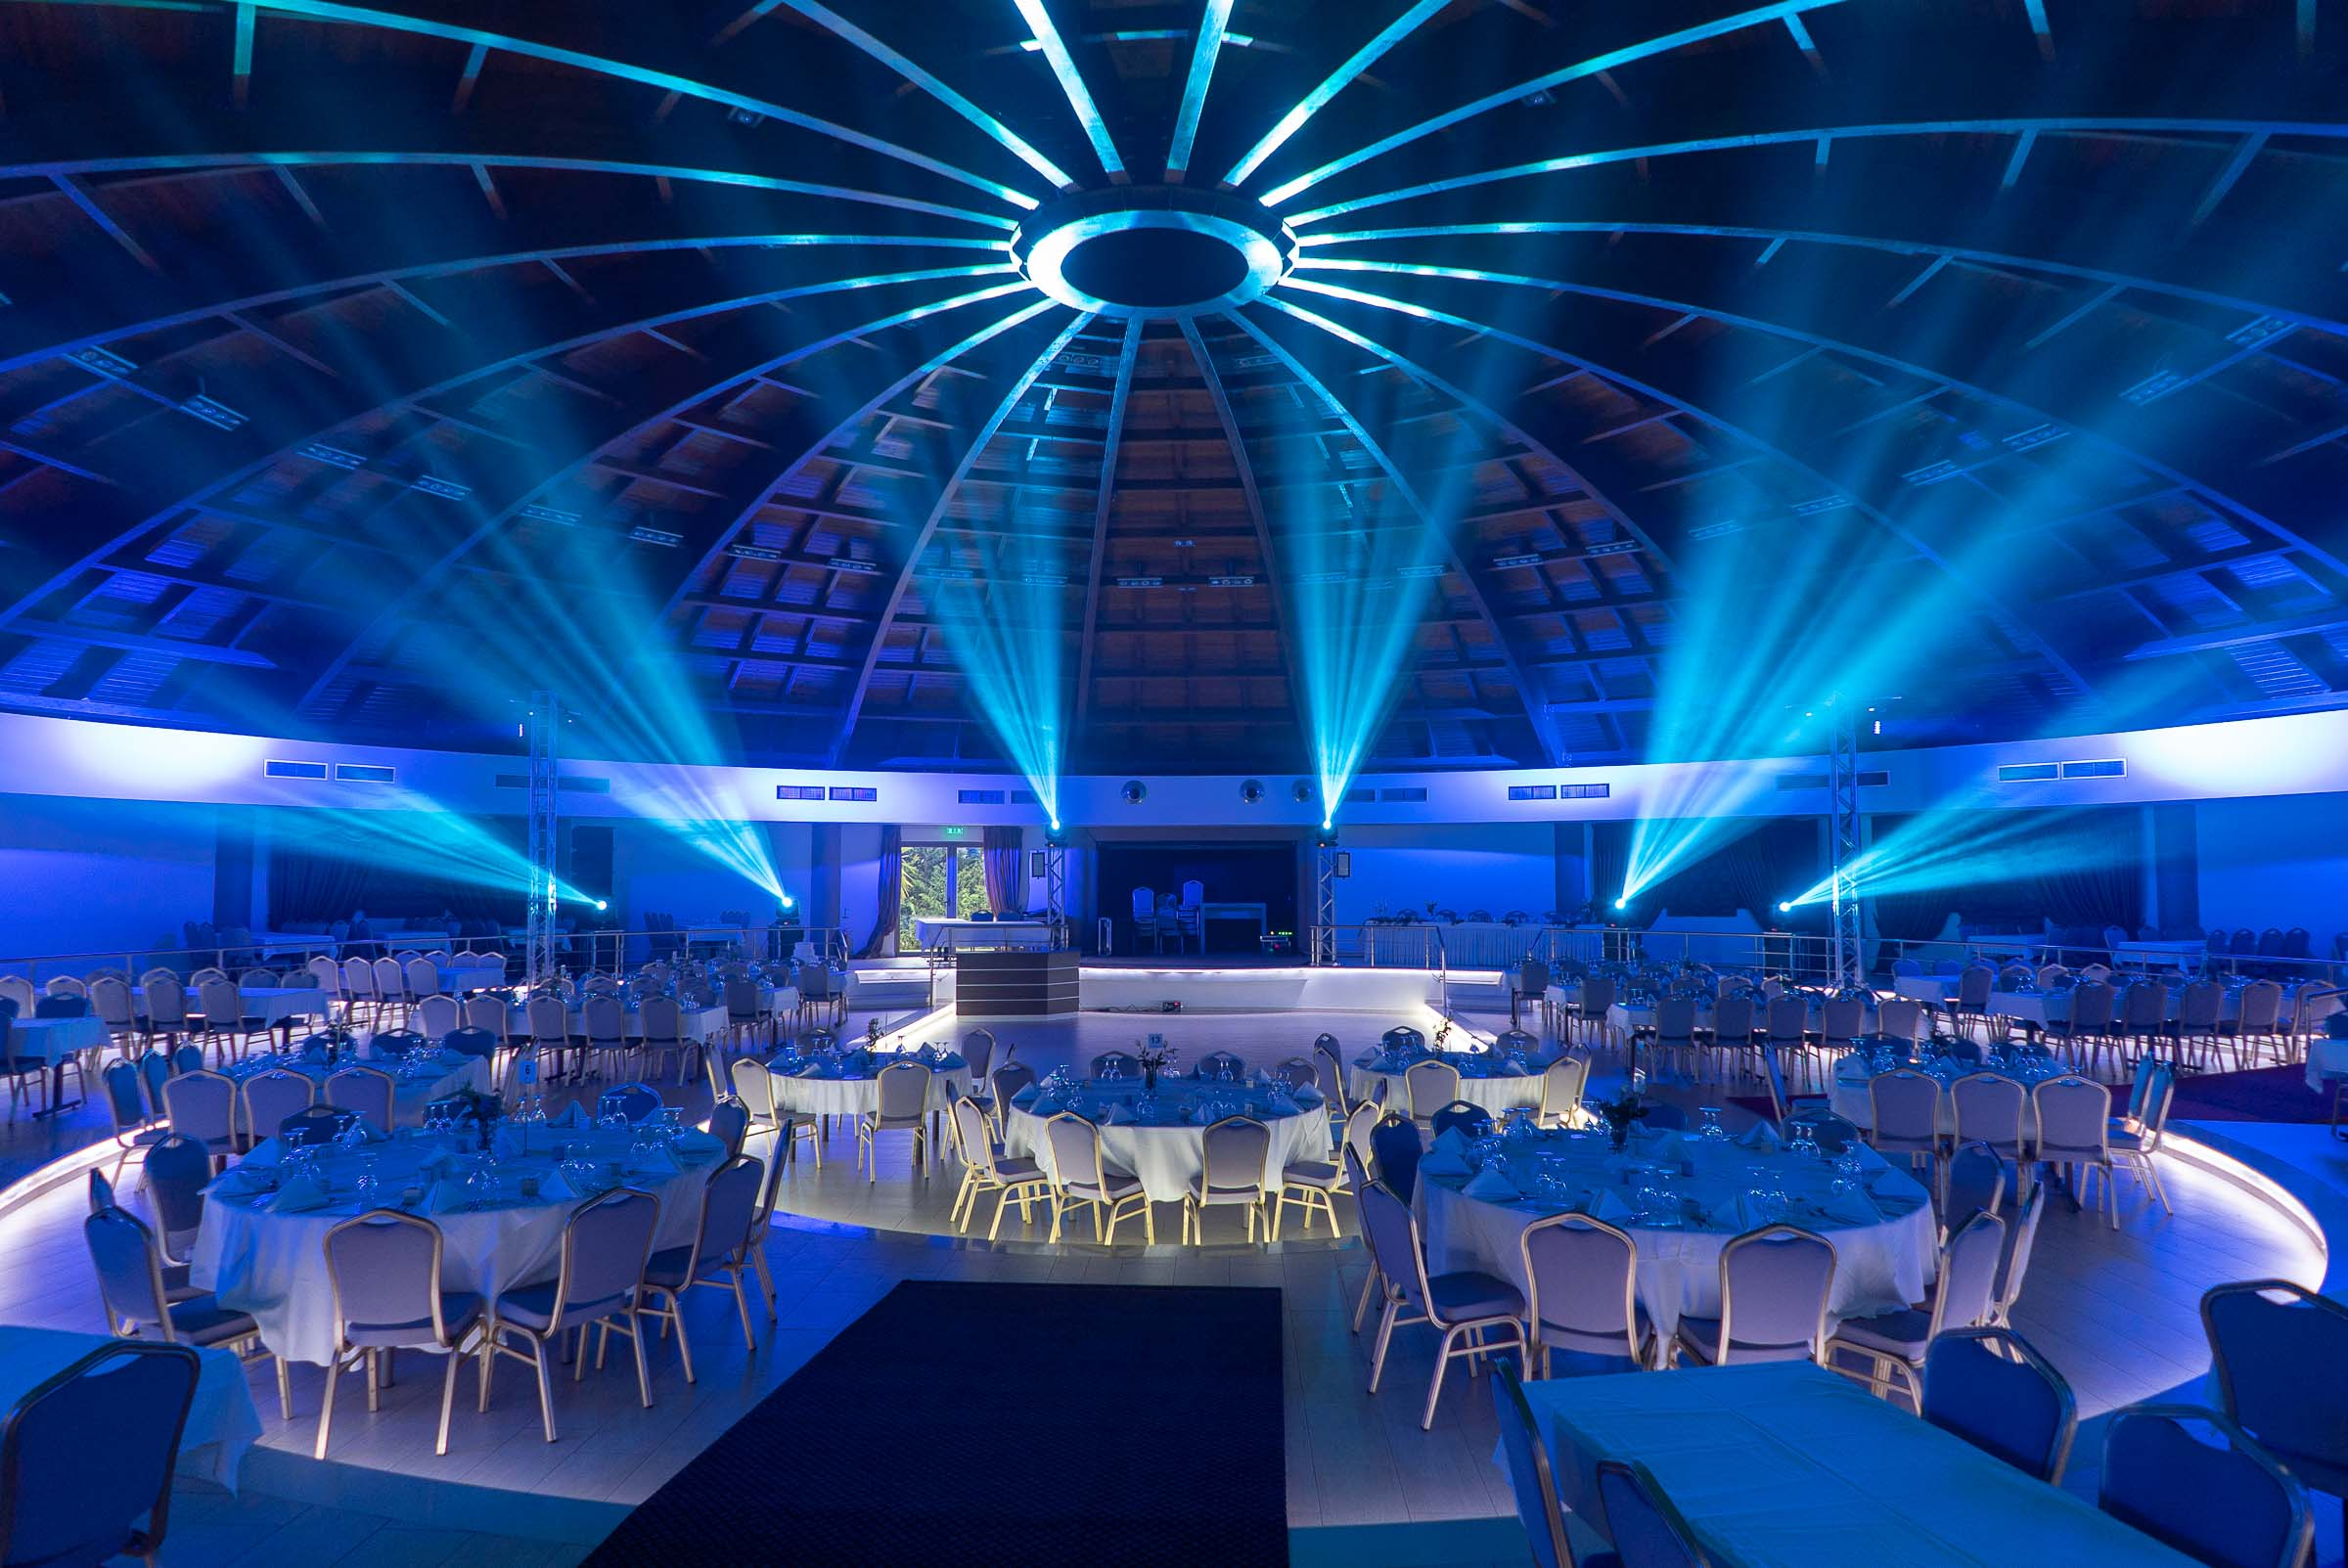 beam lights in a wedding event